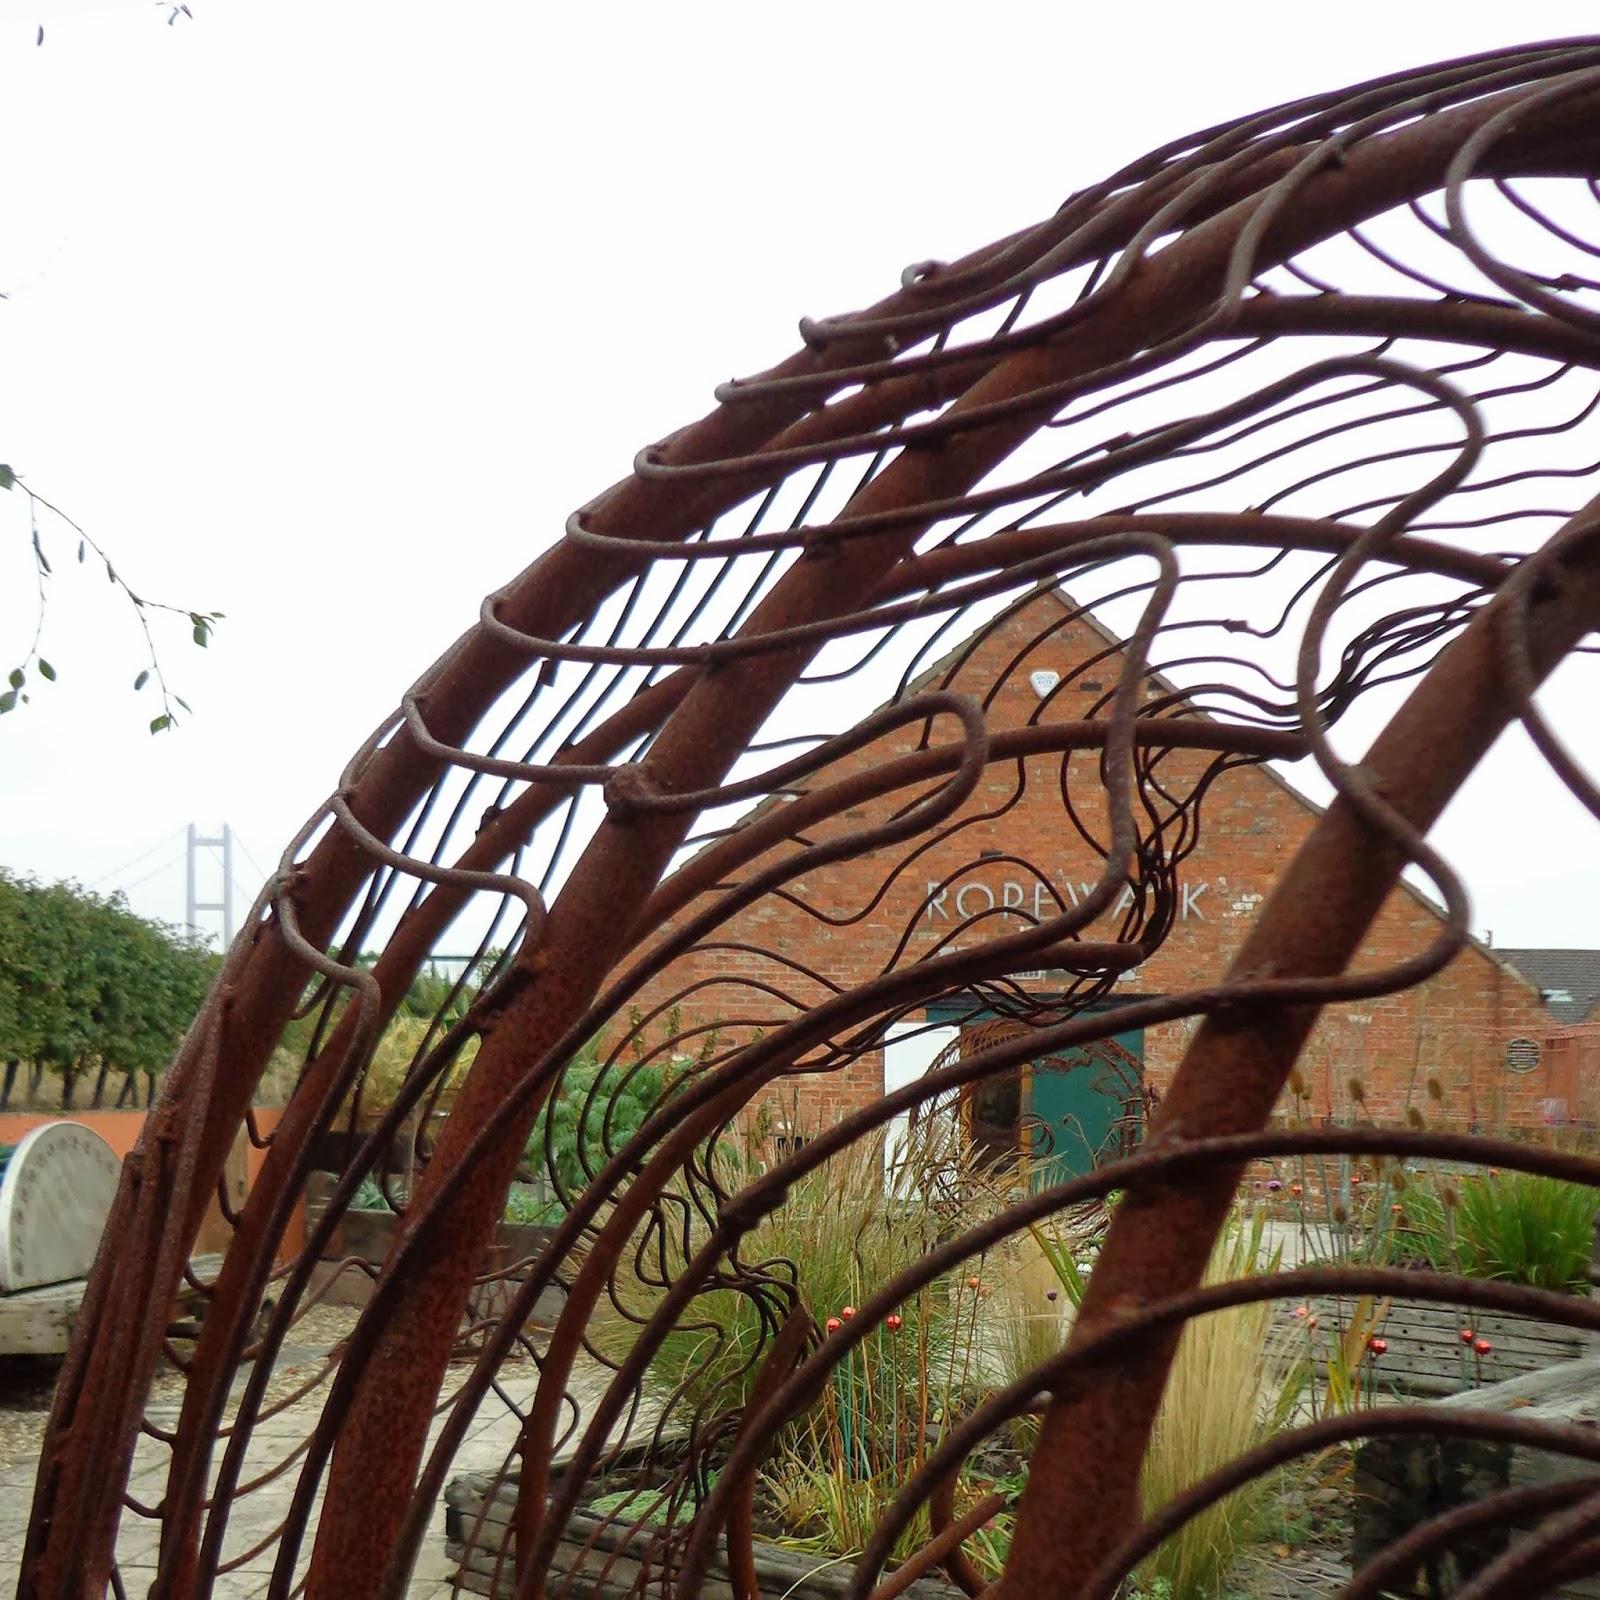 Ropewalk+from+sculpture+garden